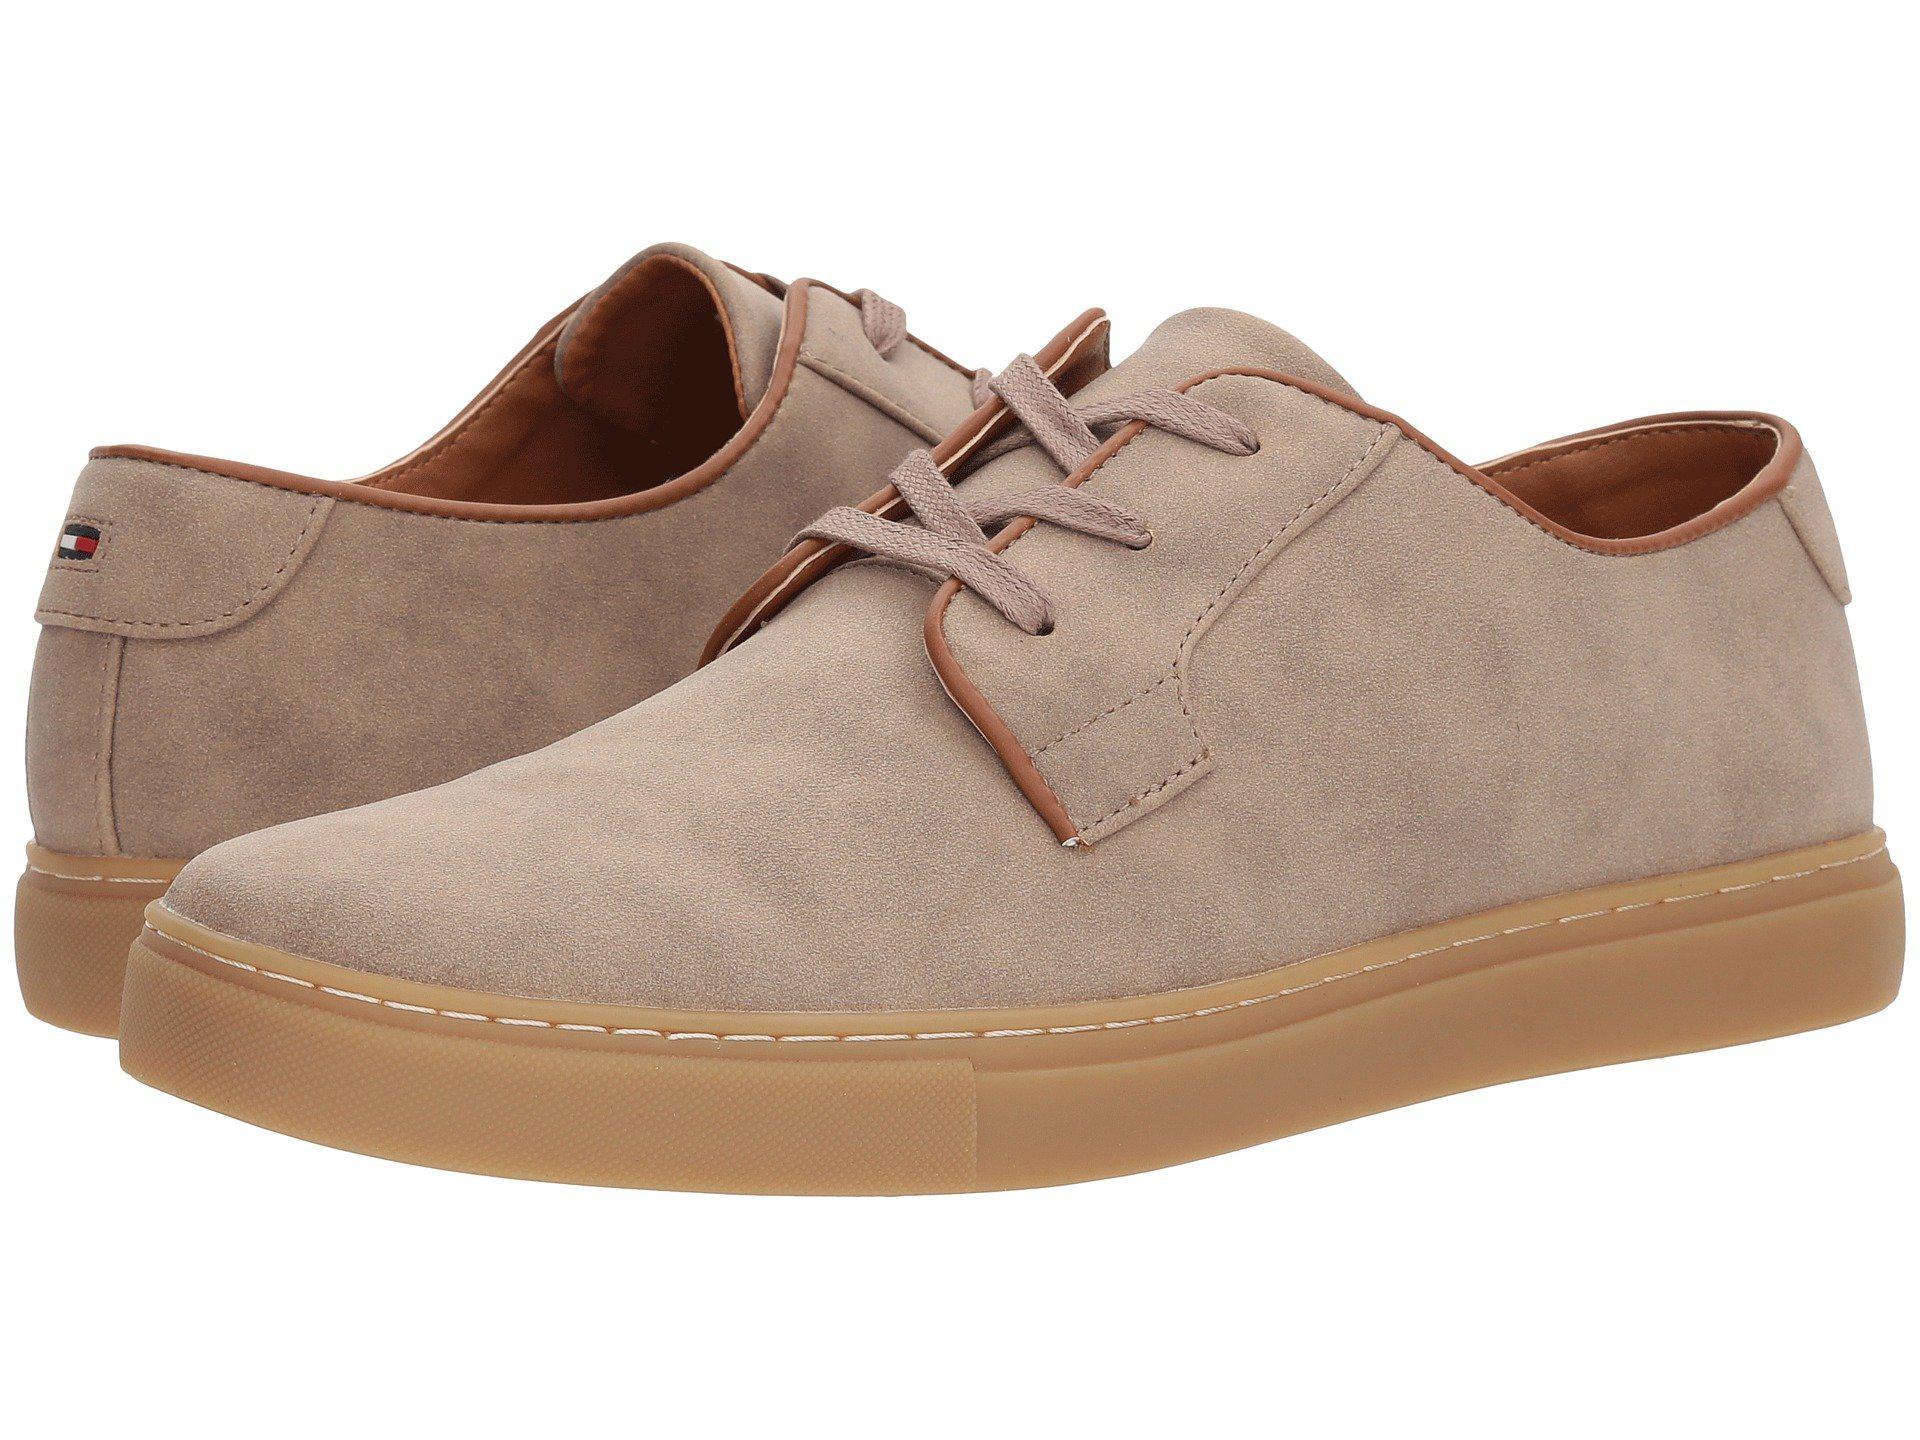 bdfa8da08ea5fd Lyst - Tommy Hilfiger Mckenzie (grey) Men s Shoes in Brown for Men